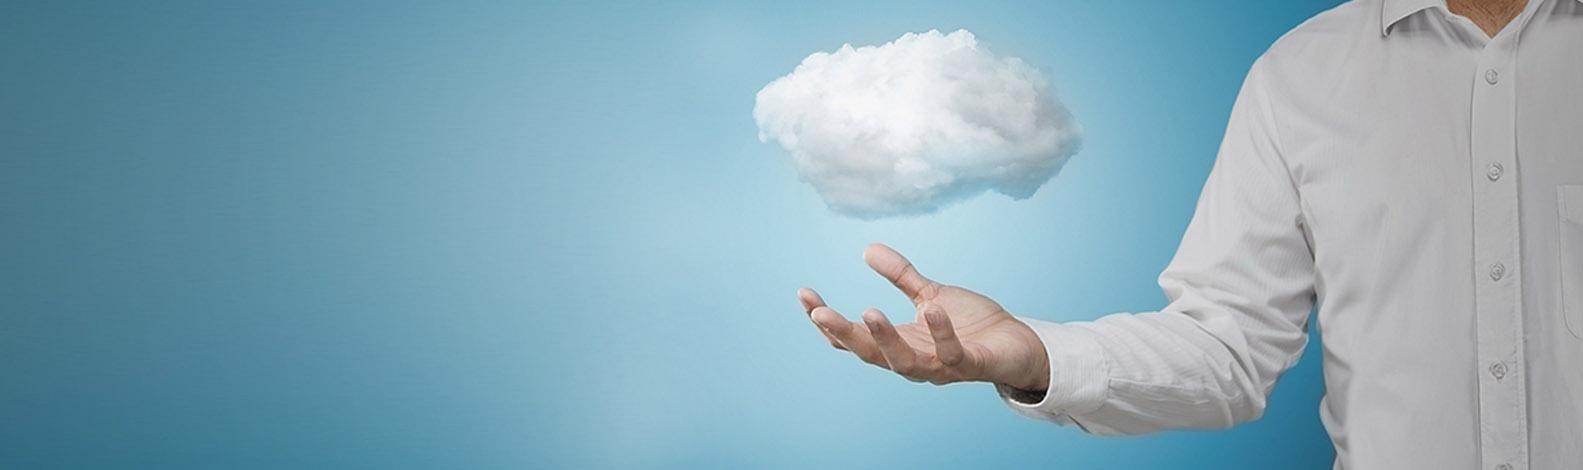 Cloud Fingertips.jpg